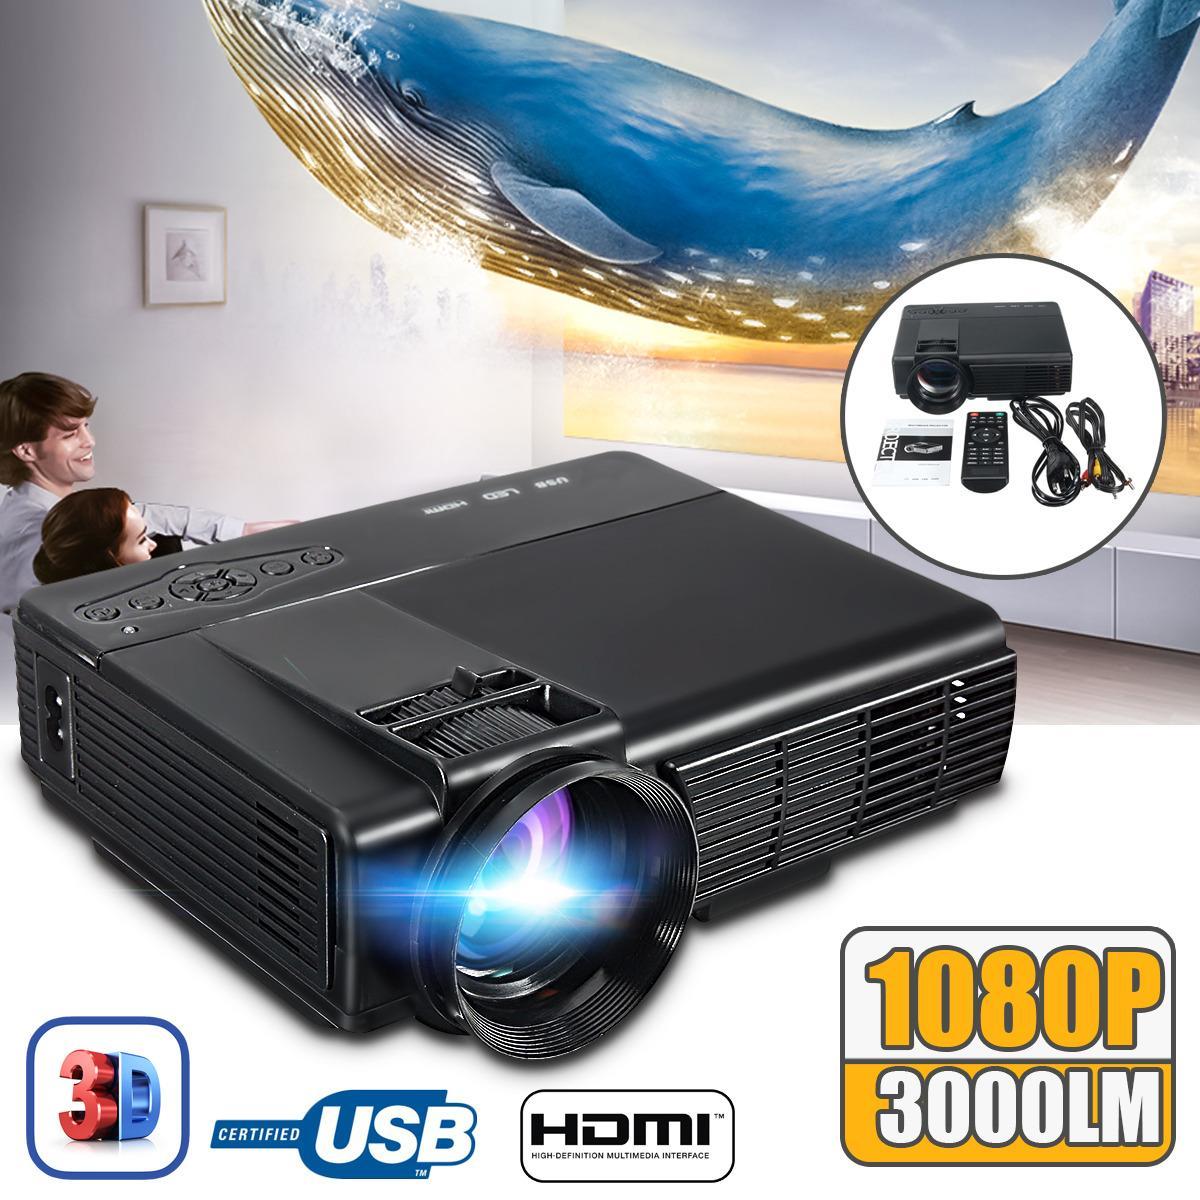 3000 Lumen 1080P HD LED 3D LCD Home Theater Projector Multimedia SD USB VGA HDMI EU Plug - intl